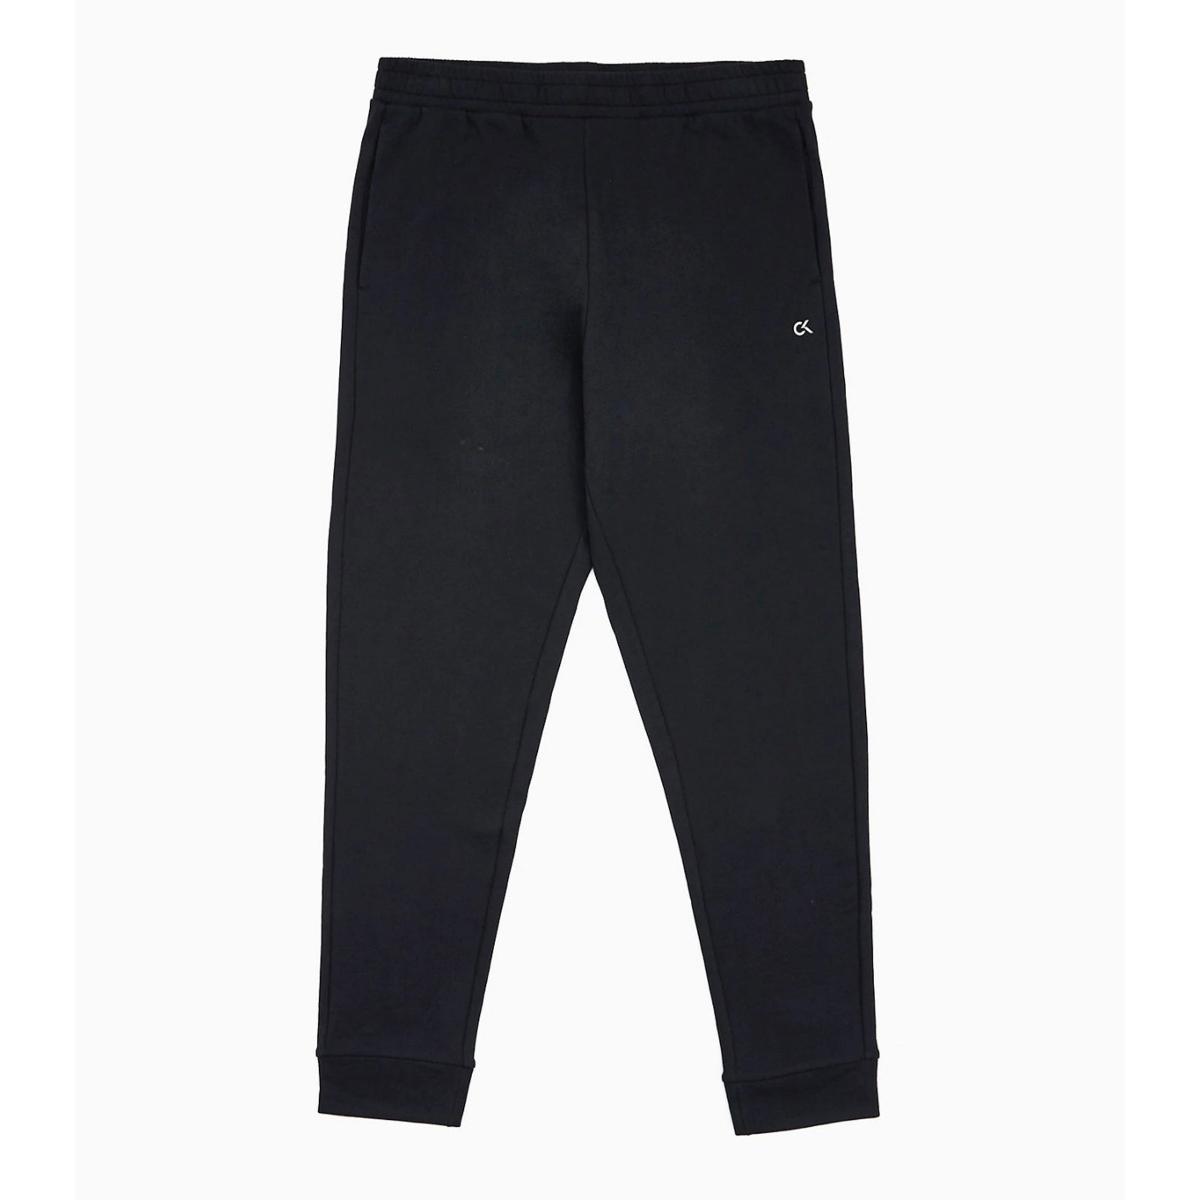 Pantaloni Calvin Klein Performance in tuta da uomo rif. 00GMT9P649